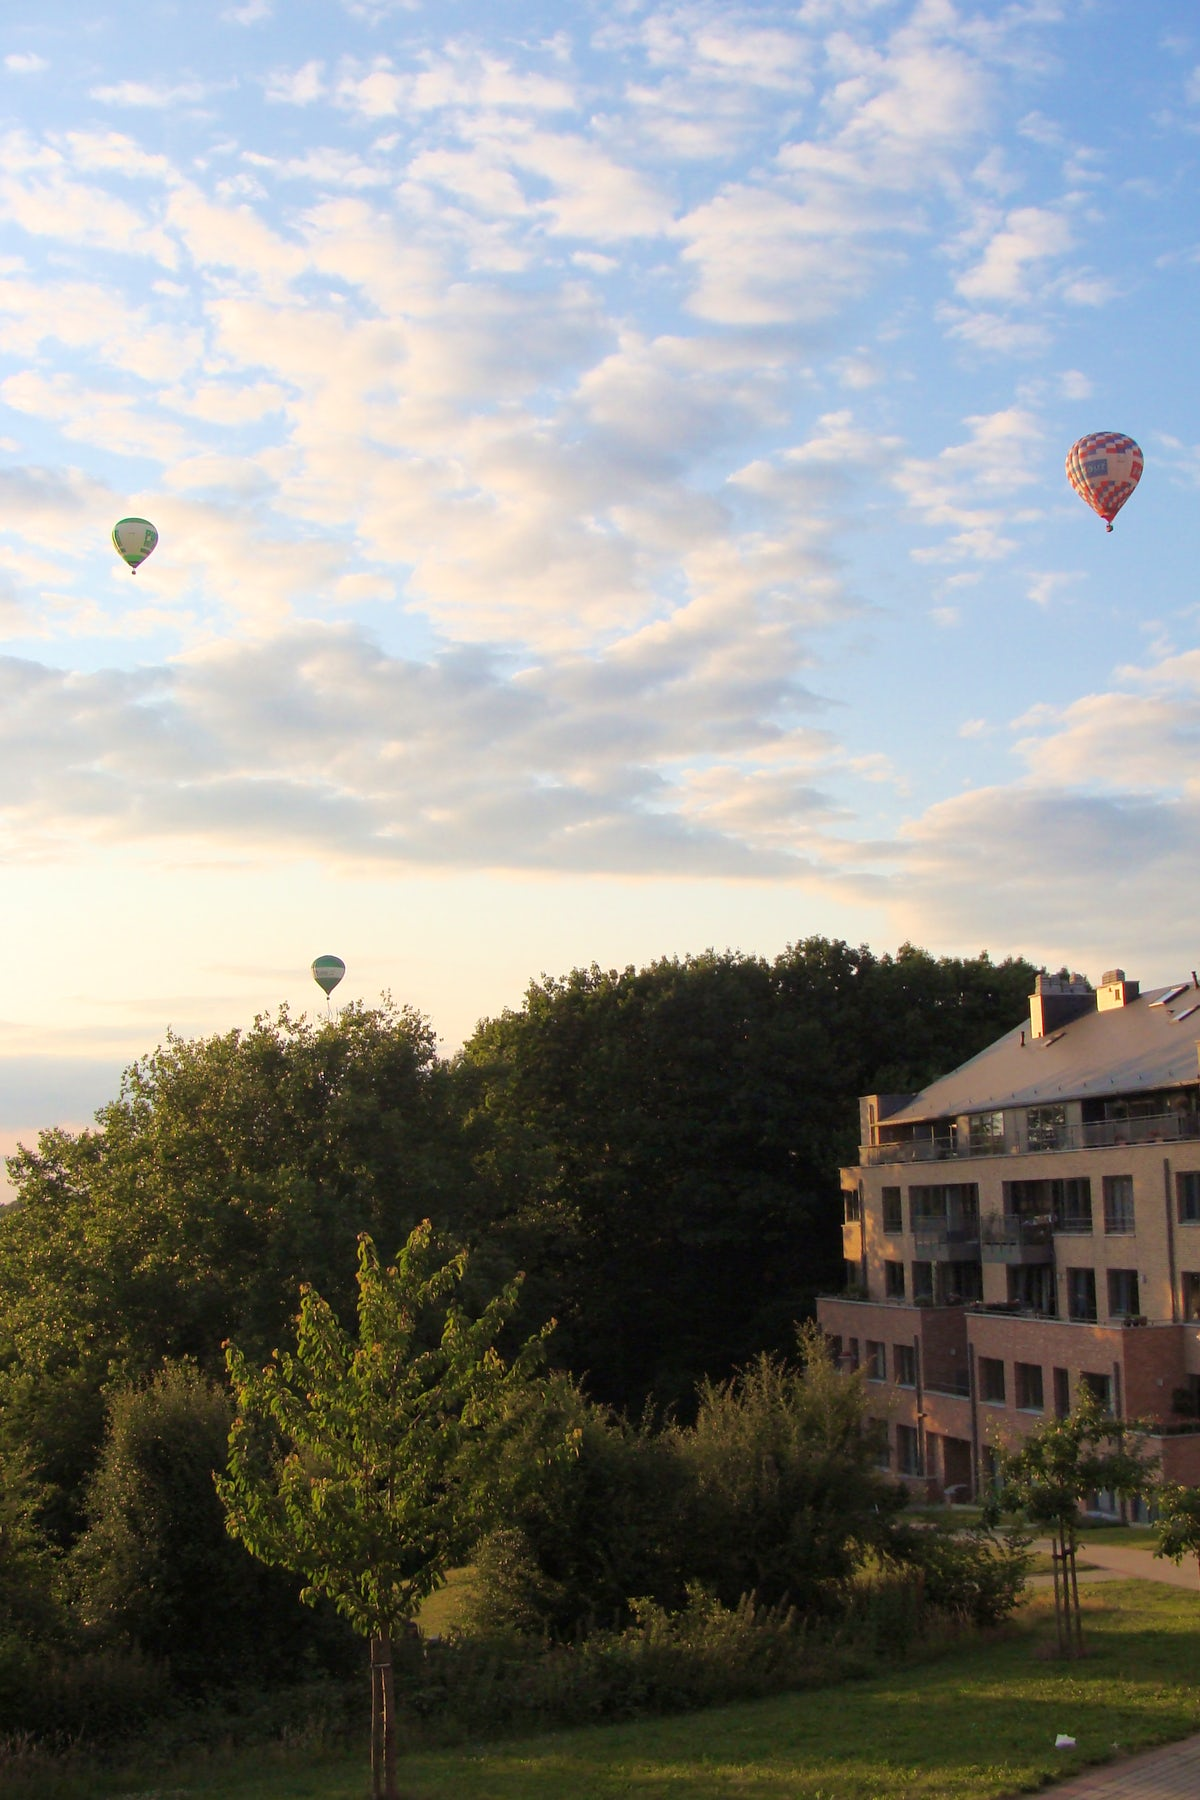 Louvain-la-Neuve: a city created only for University students